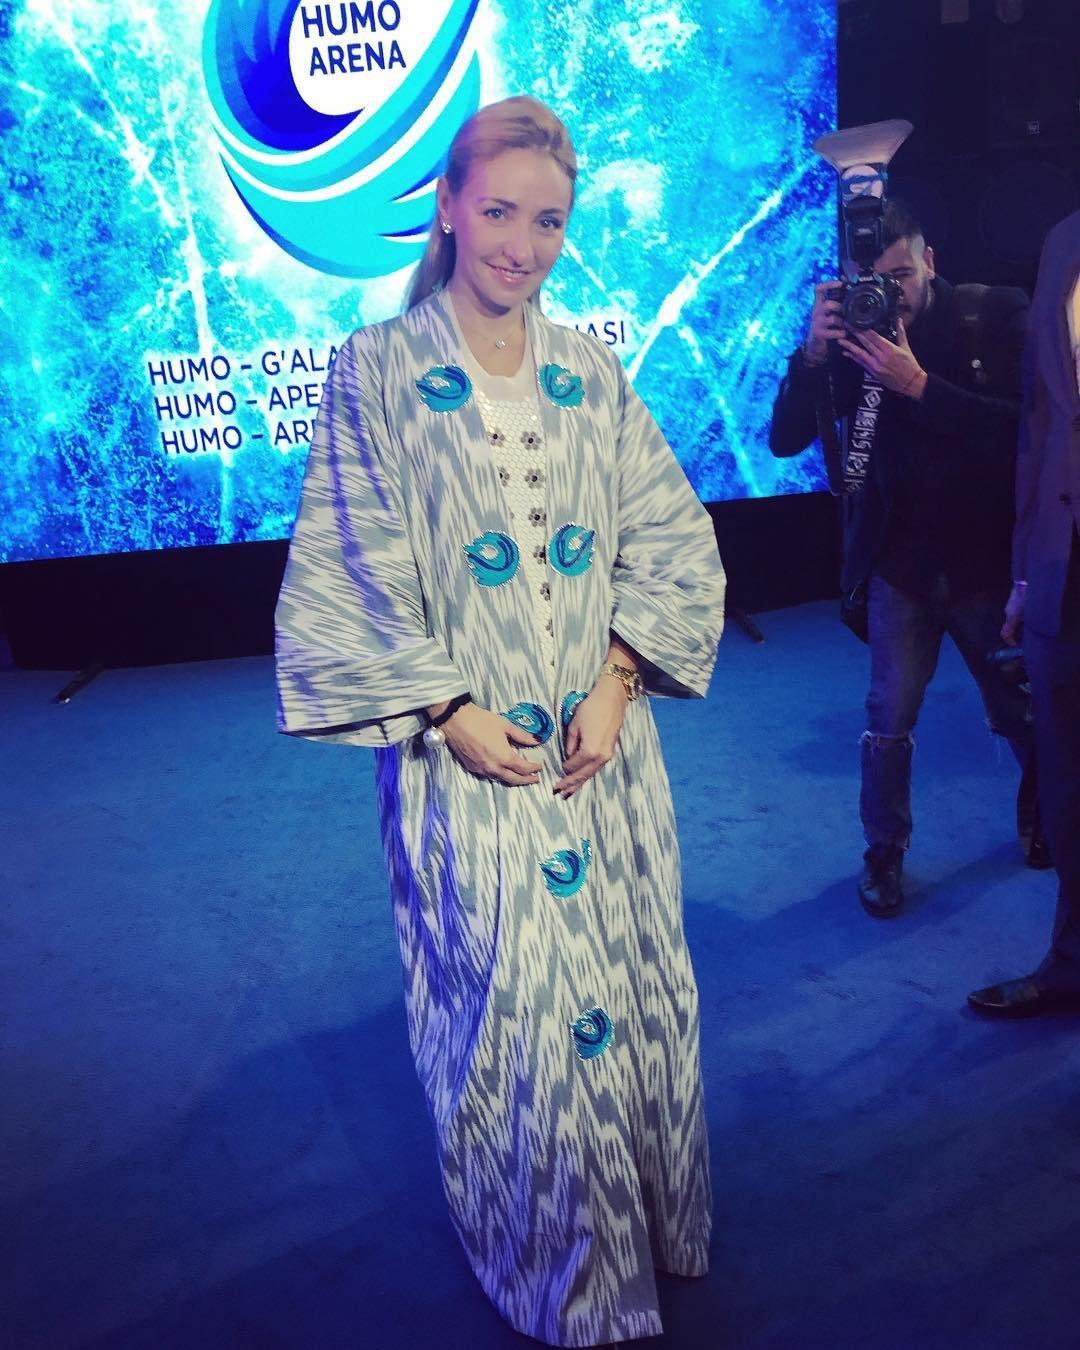 Ледовые шоу-2018-2019 - Страница 8 1552668641_53275062_366827277243616_239282811316423948_n